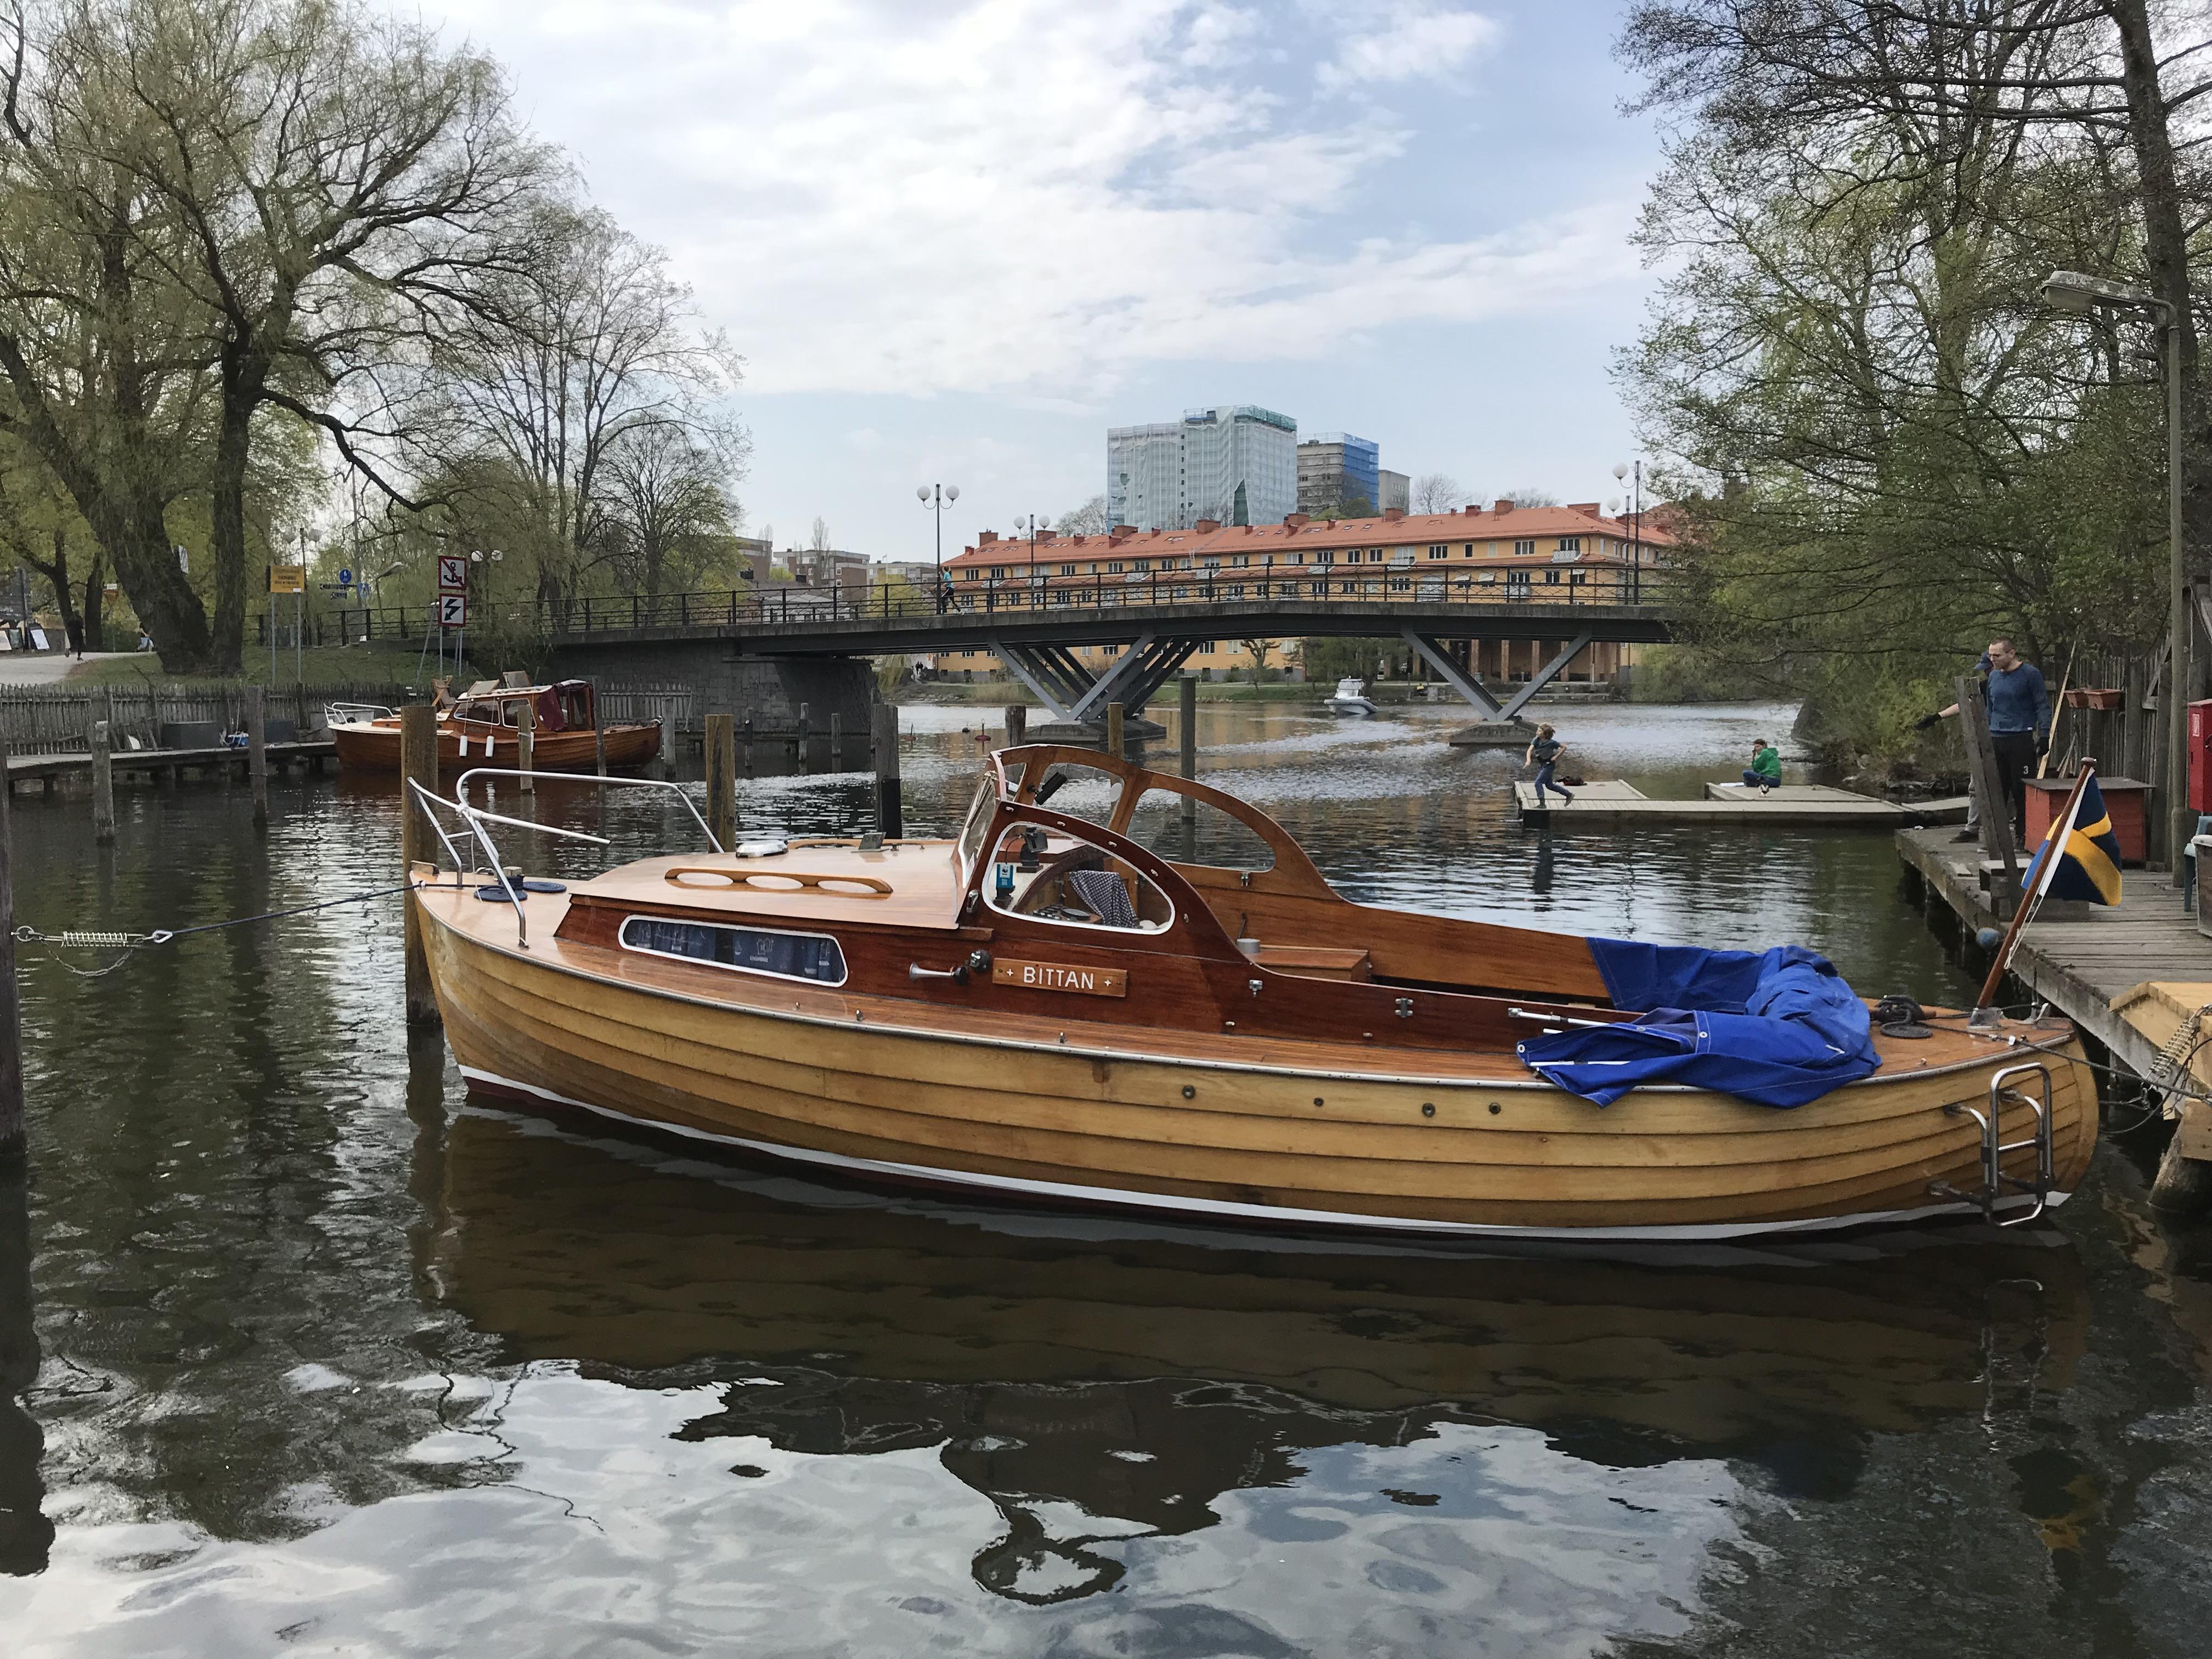 Bittan_-_swedish_wooden_boat.jpg